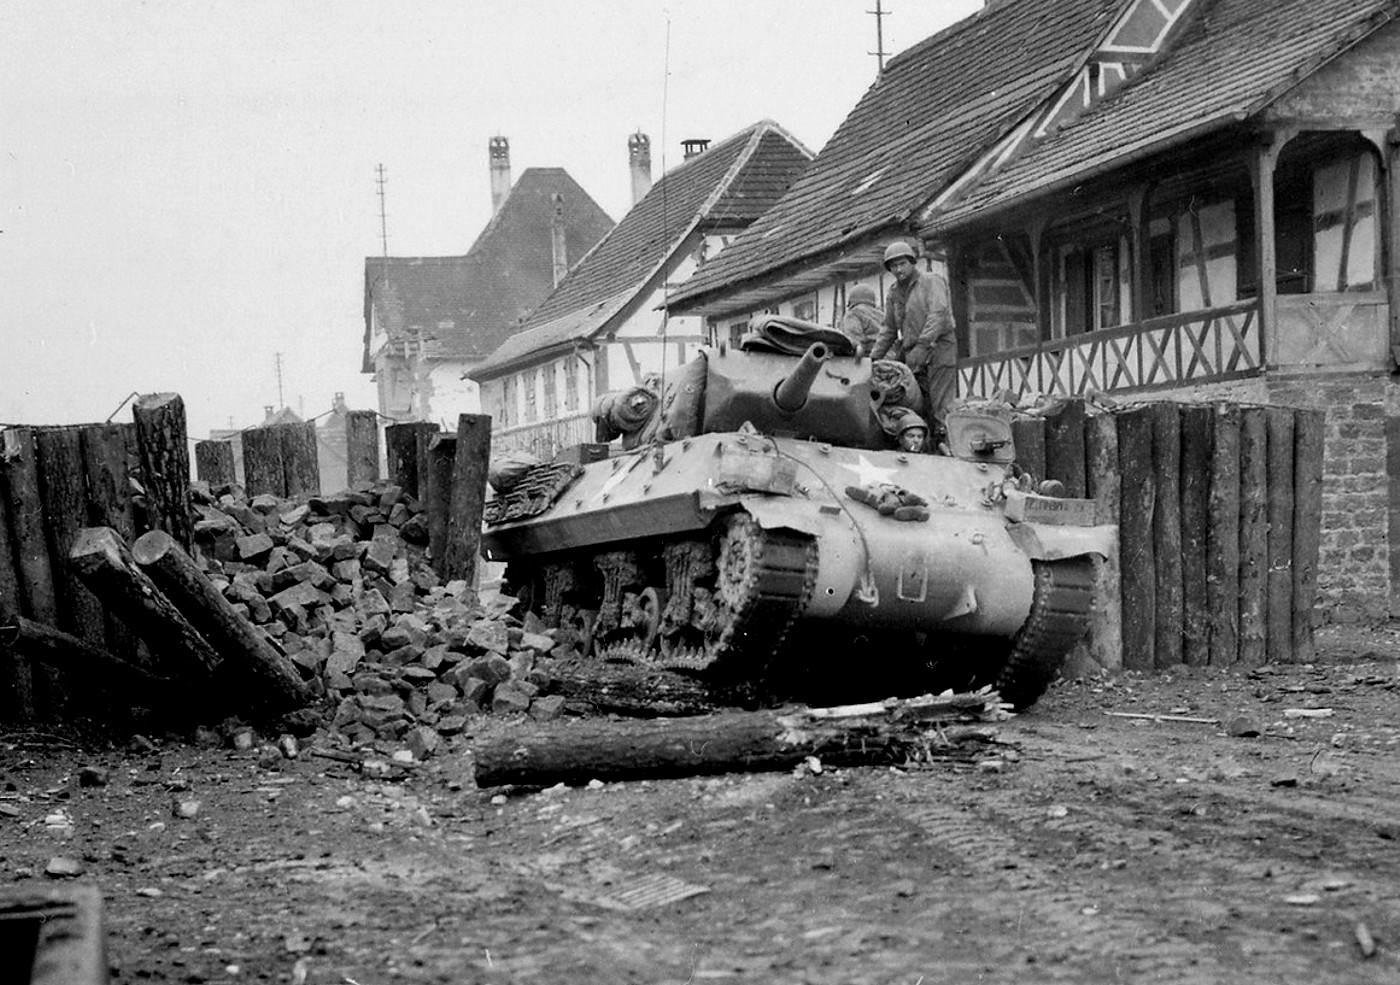 645TD M10 44 - Un TD traverse un village